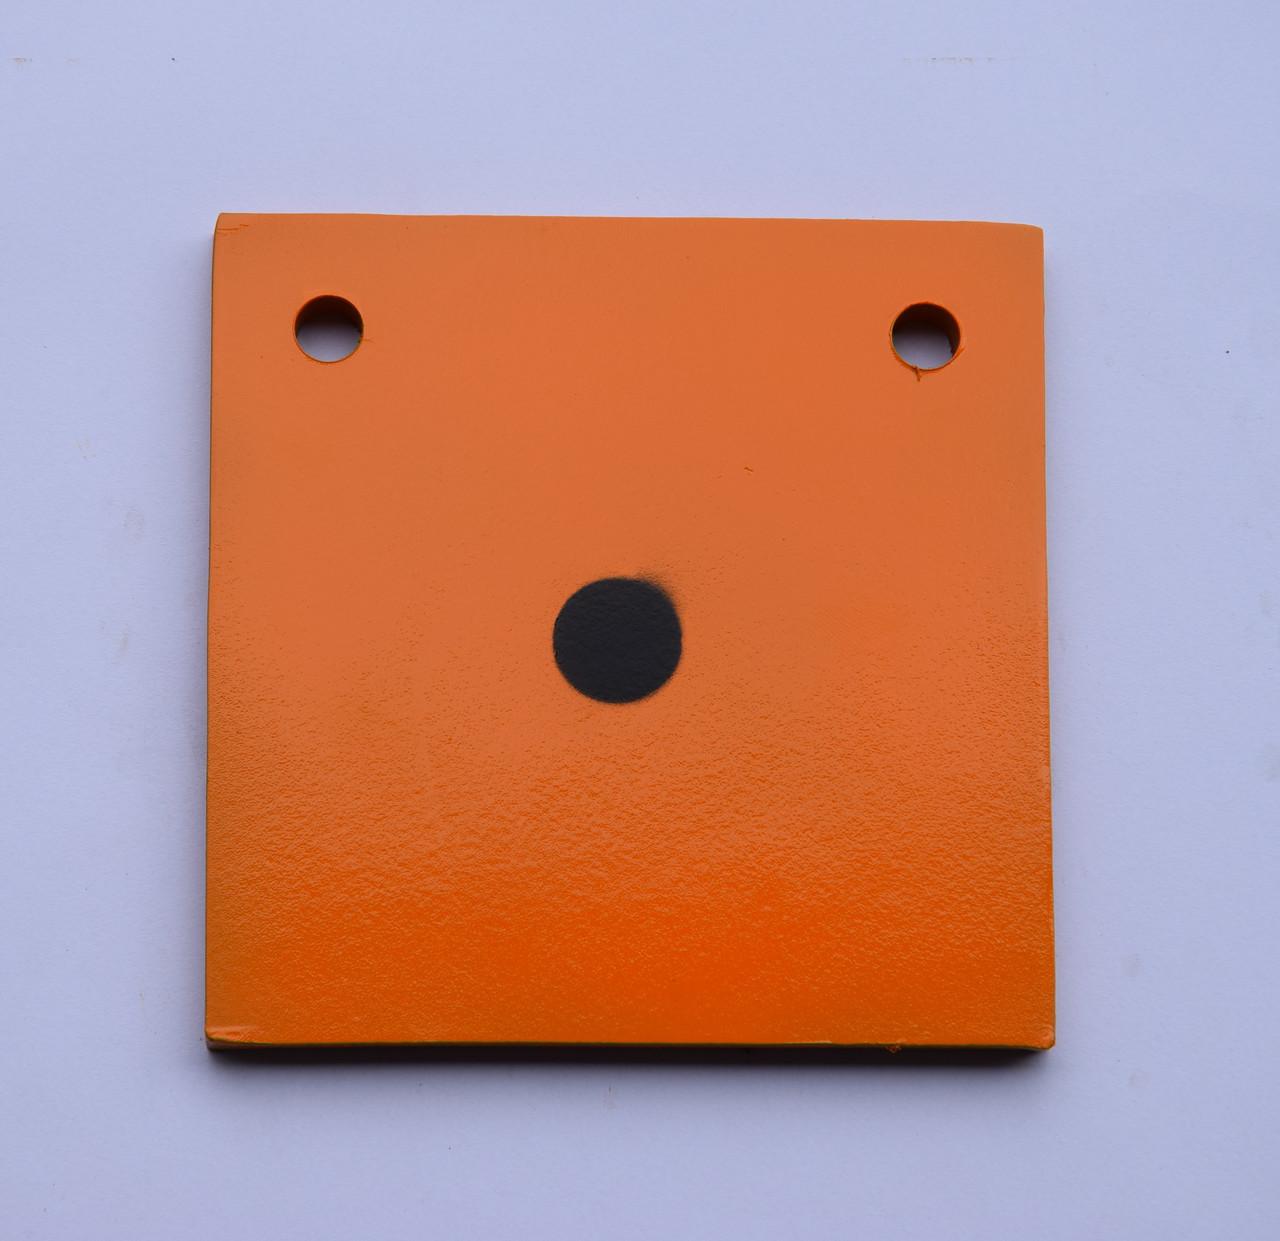 Гонг мишень 150х150 Квадрат Сателит (608)